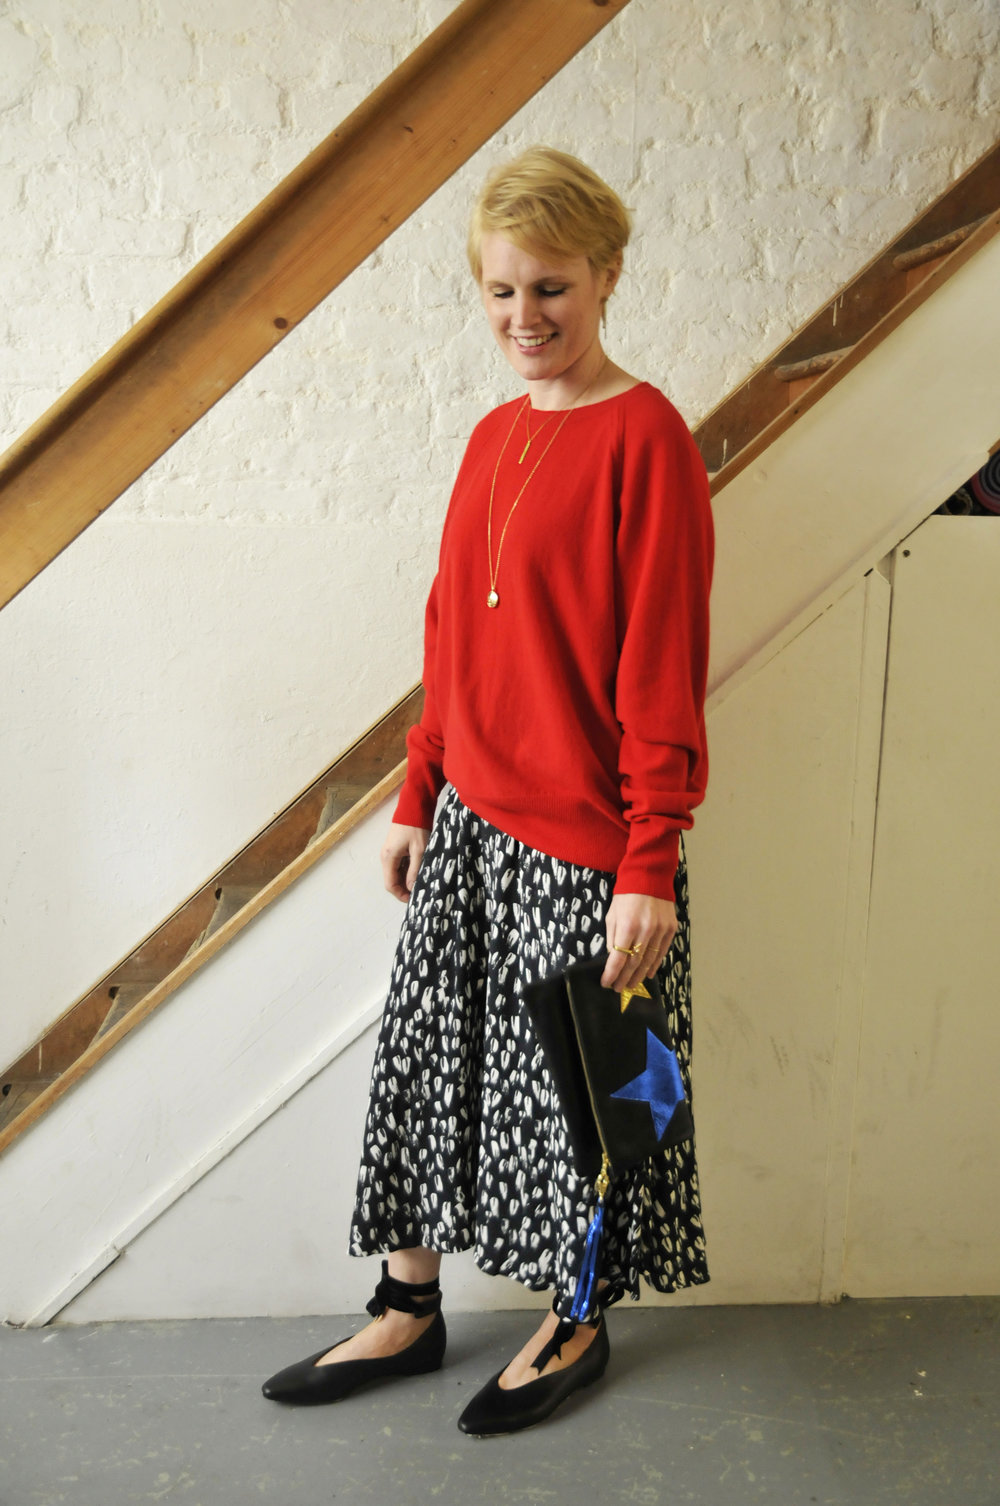 Maske Jumper and Skirt  Sarah Baily Bag  Miista Shoes